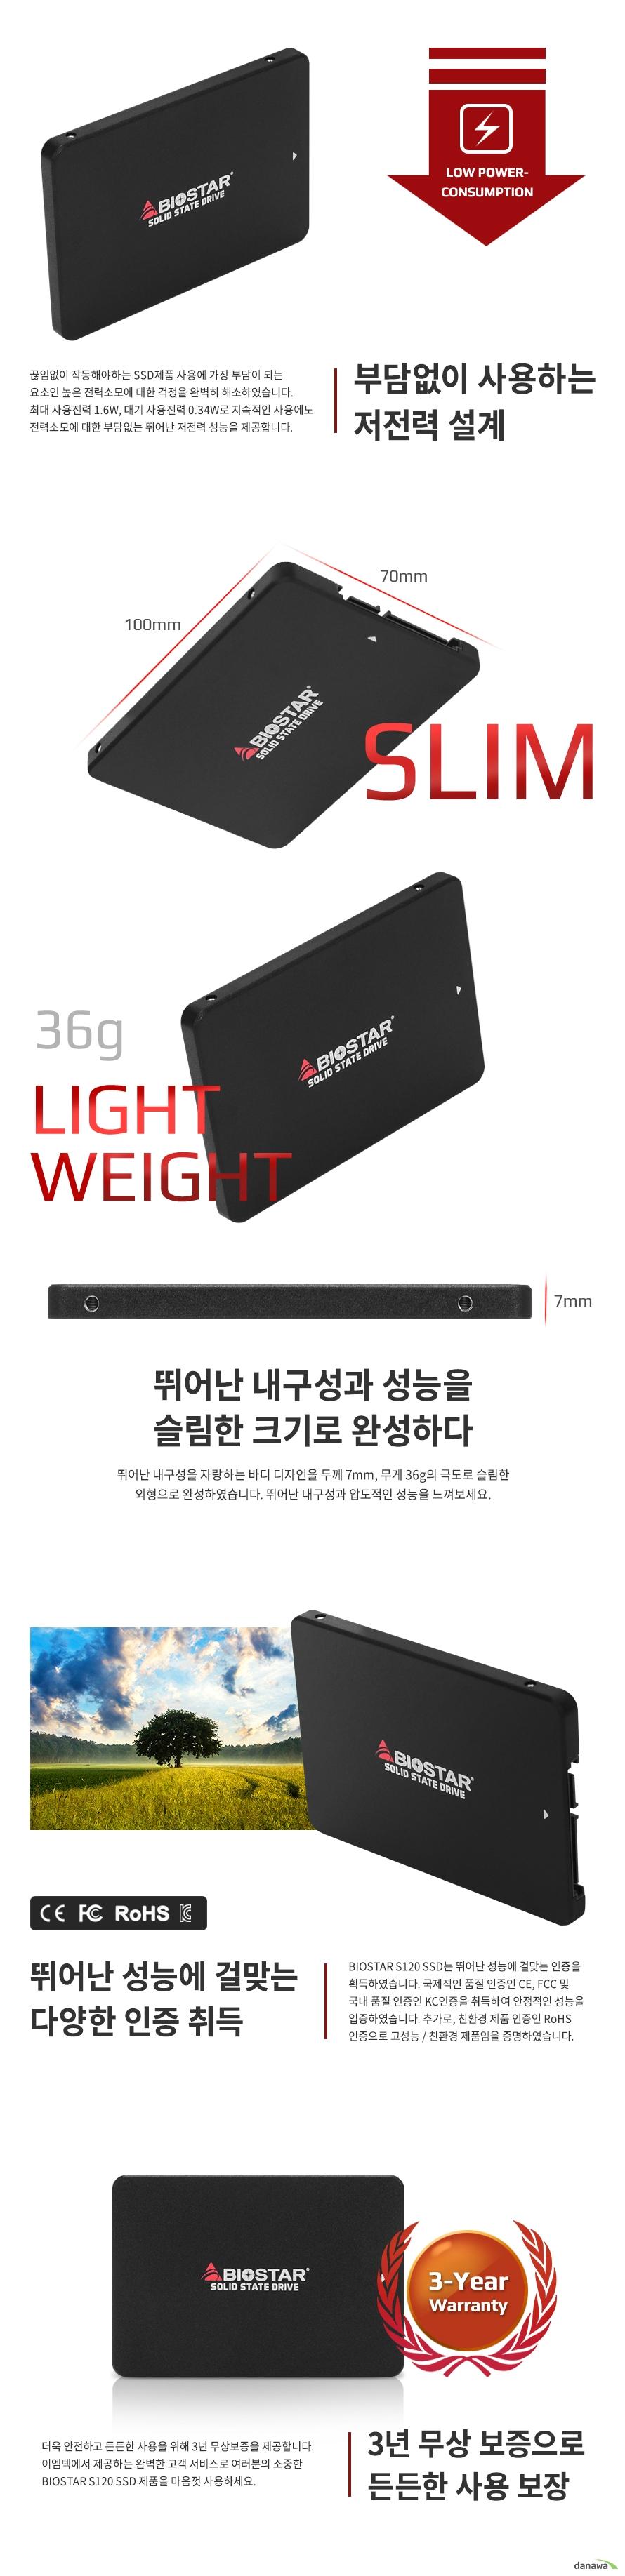 BIOSTAR S120 (512GB)